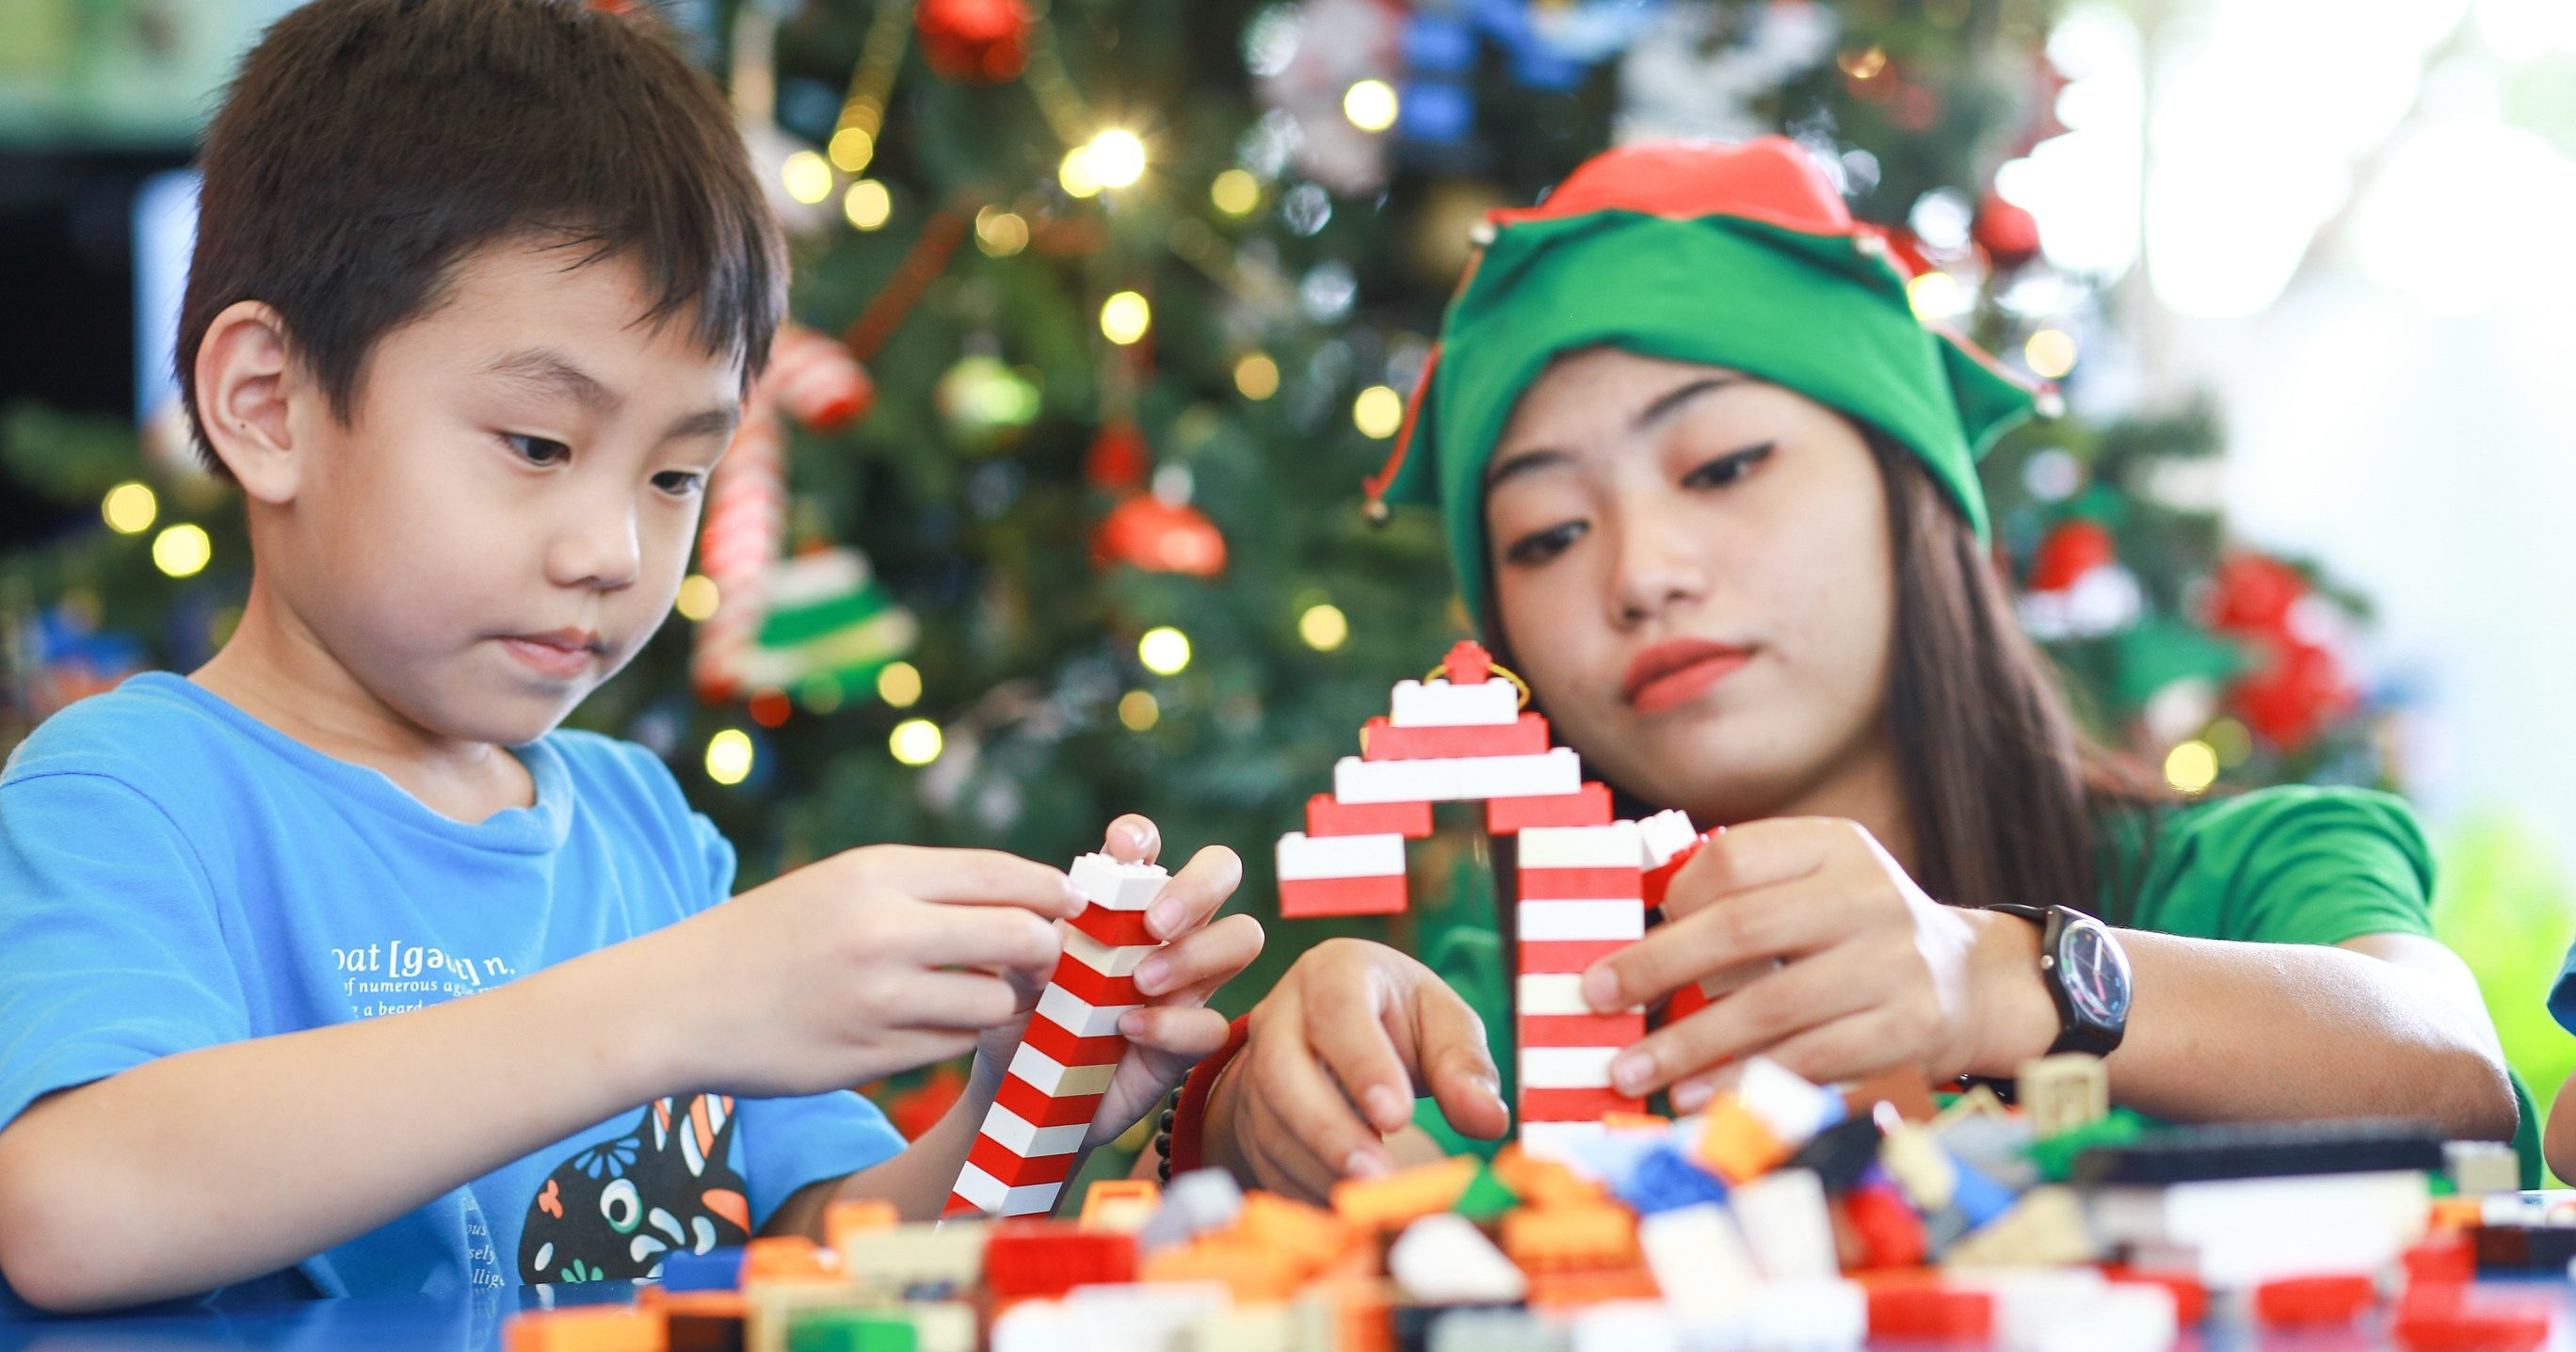 LEGOLAND Malaysia Elves assisting children on their LEGO ...